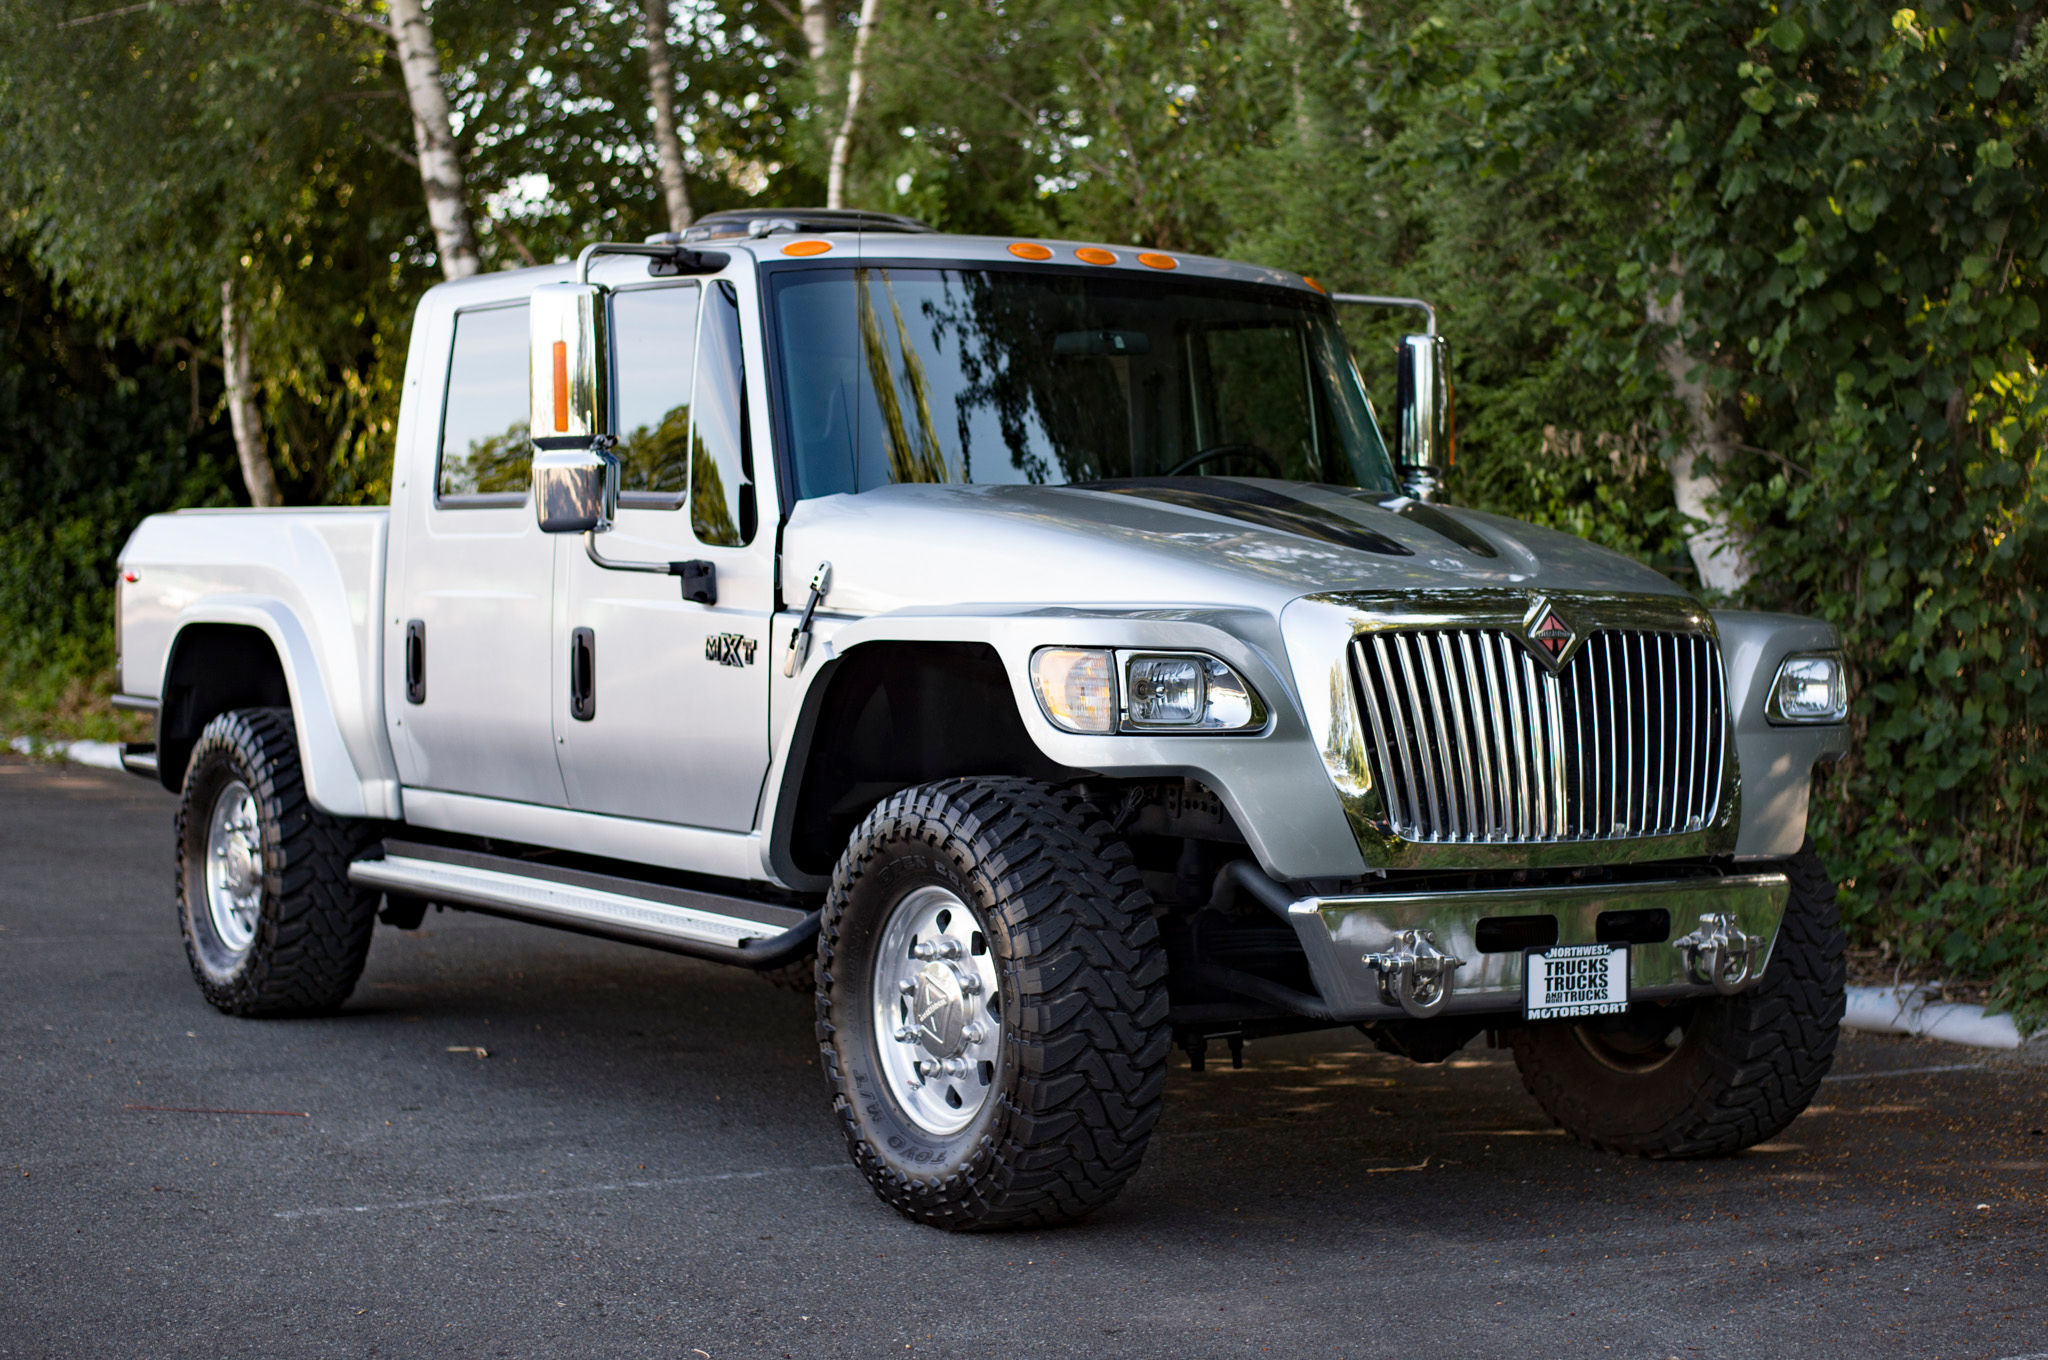 International Mxt For Sale >> Used 2008 International Mxt 4x4 Diesel Truck For Sale Northwest